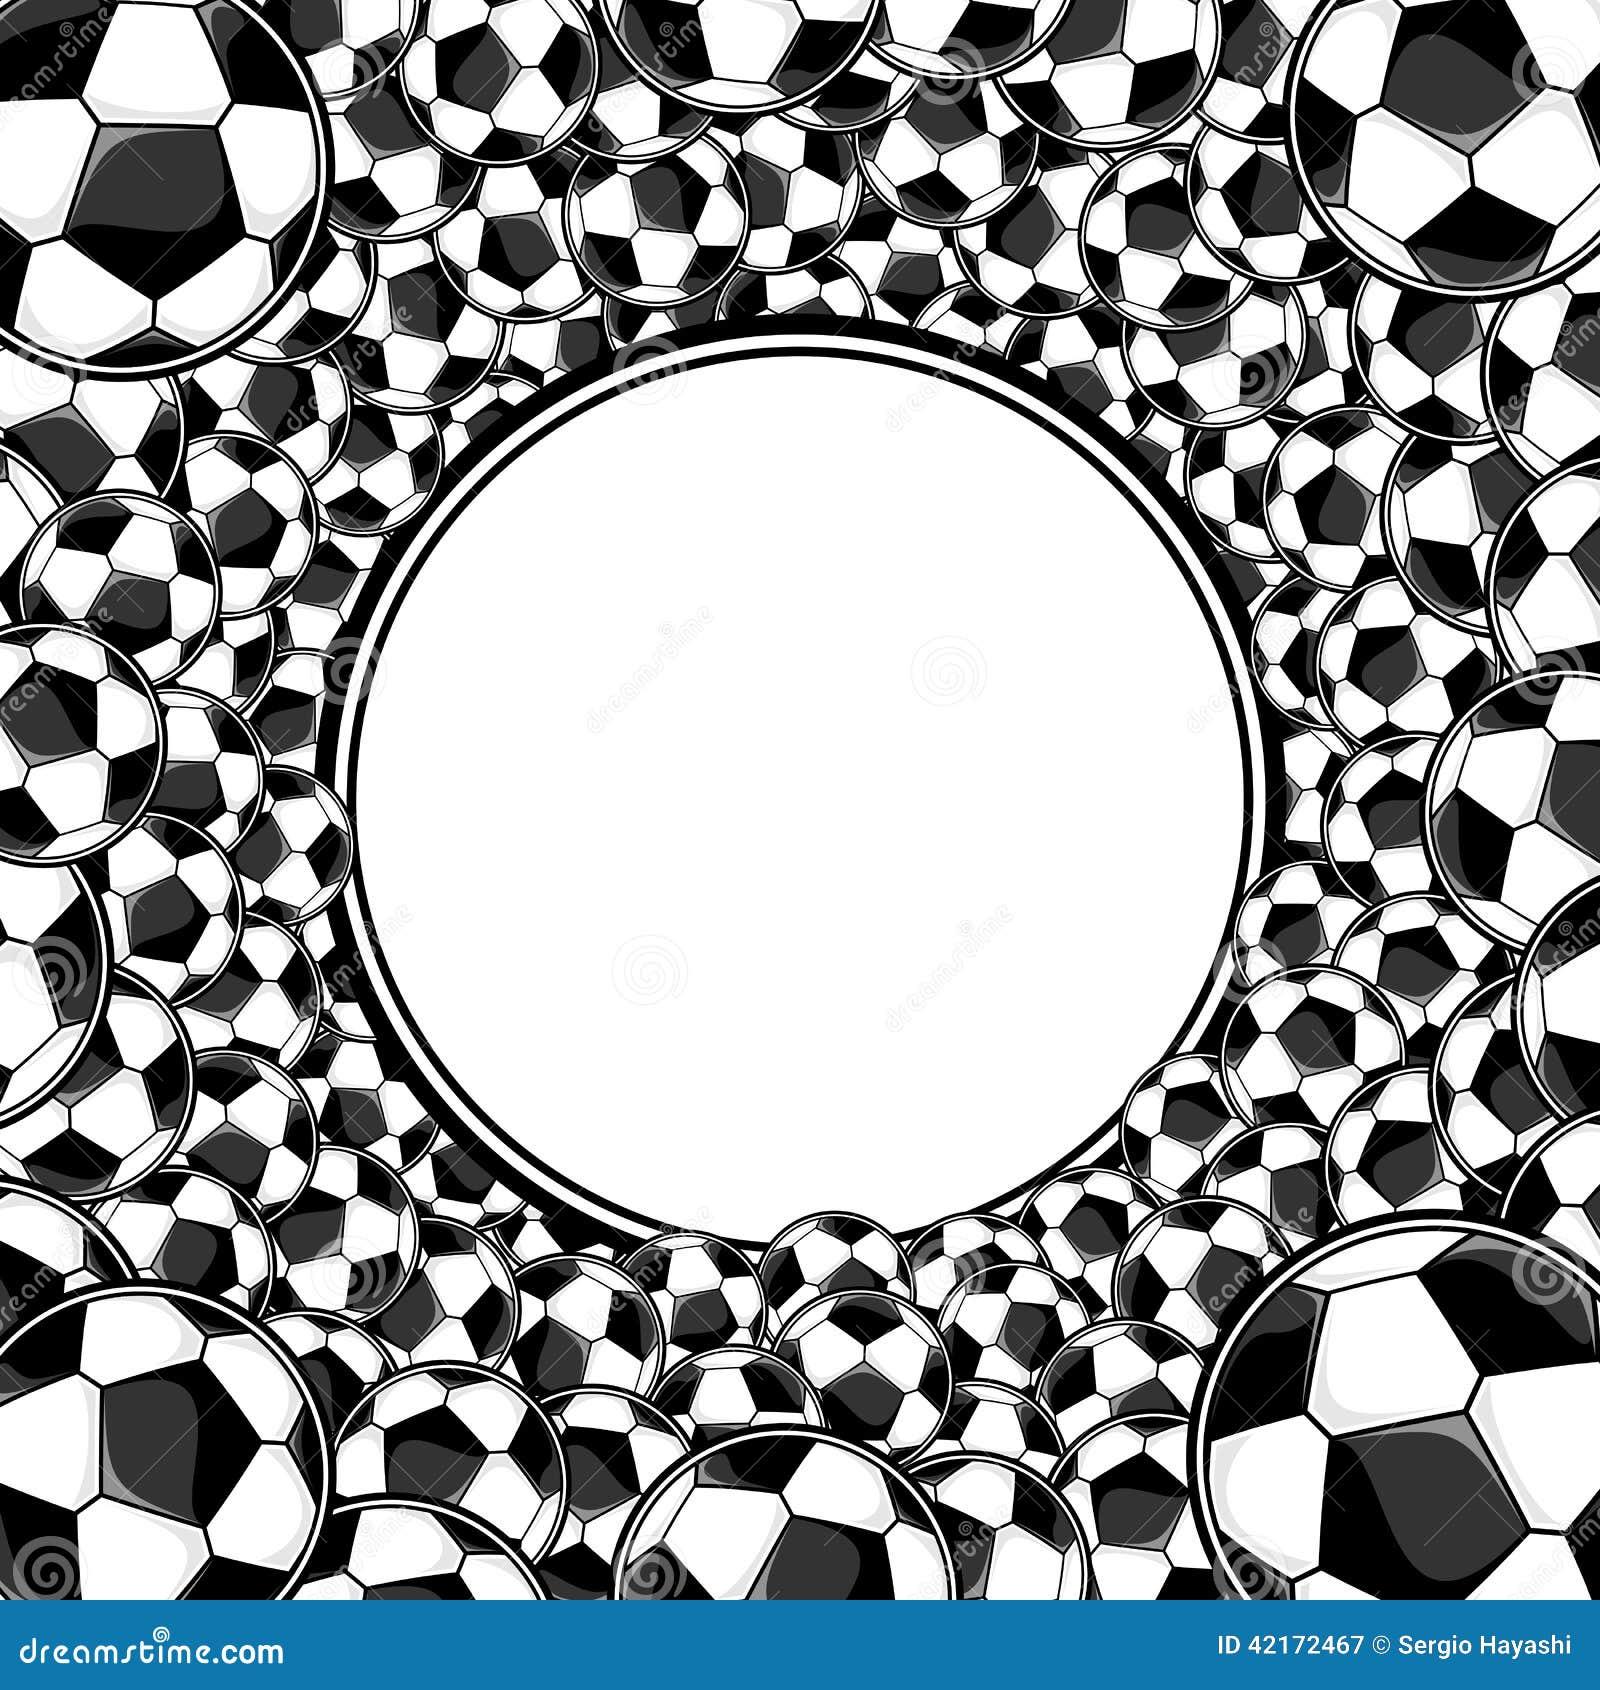 De voetbalballen omcirkelen ontworpen achtergrond